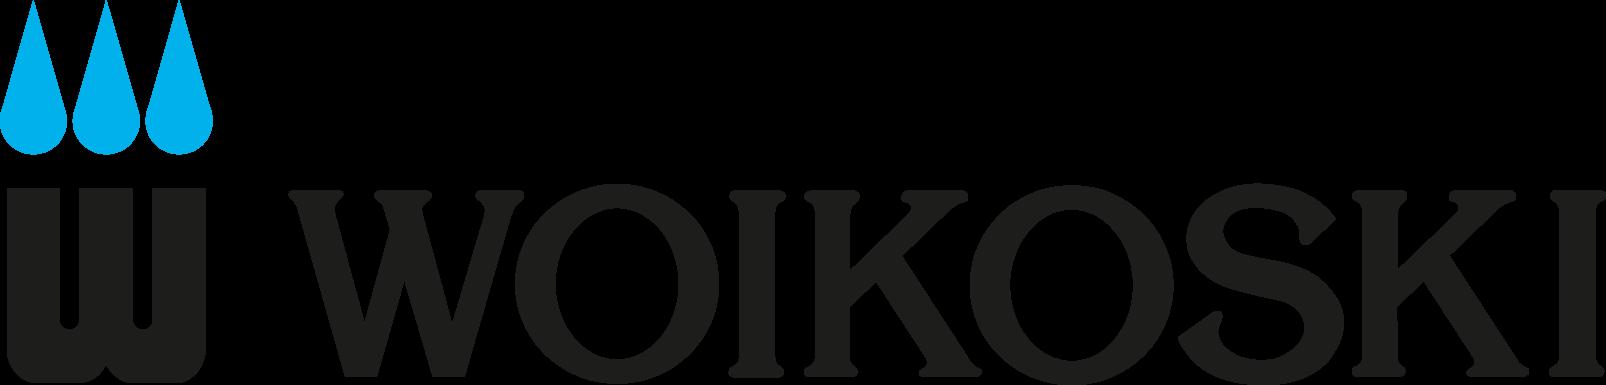 Woikoski_liikemerkki_vaaka.png